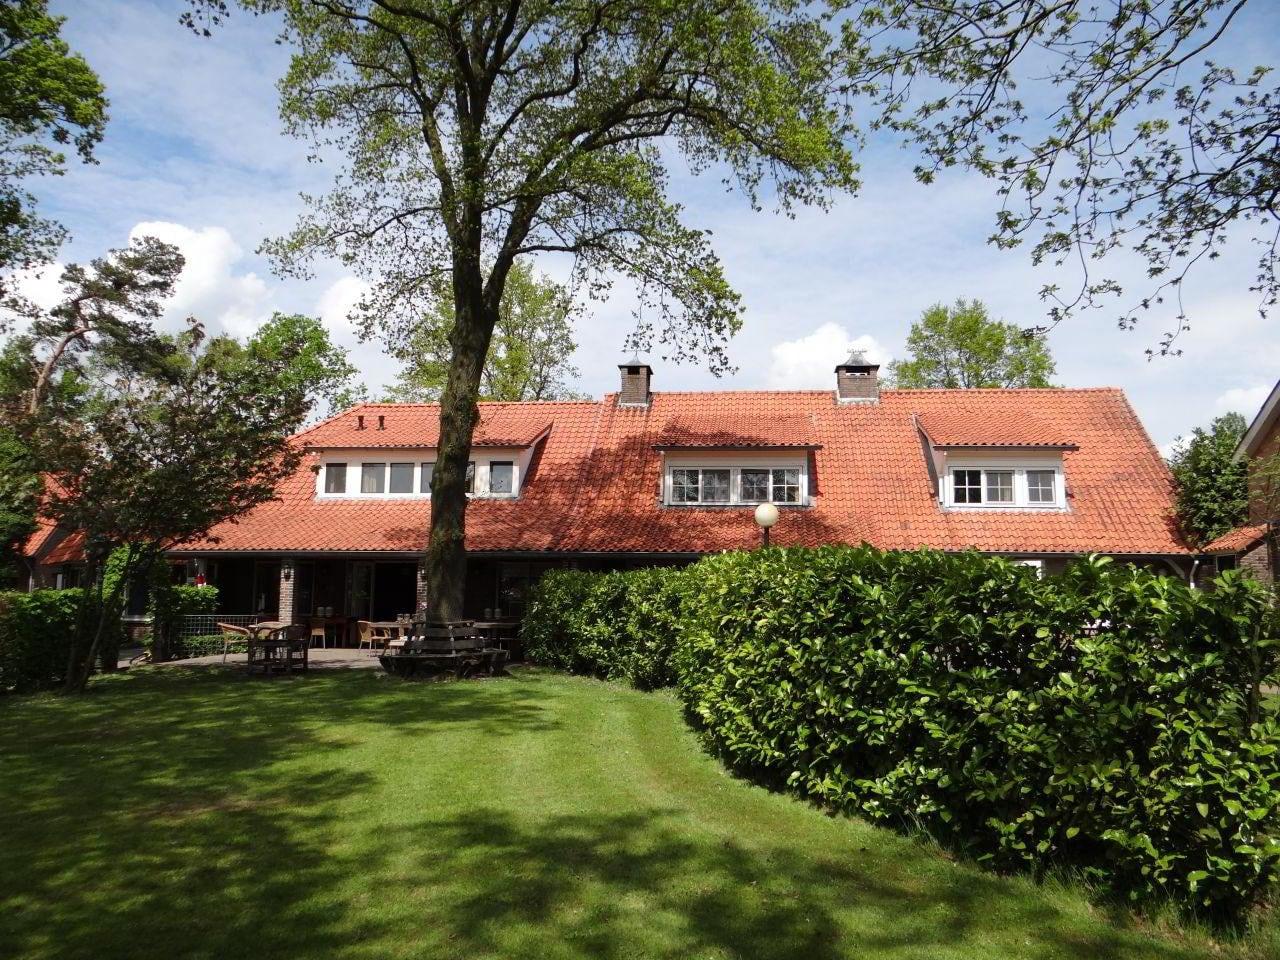 Twentehoeve-vakantiehuis-kleilutte-2